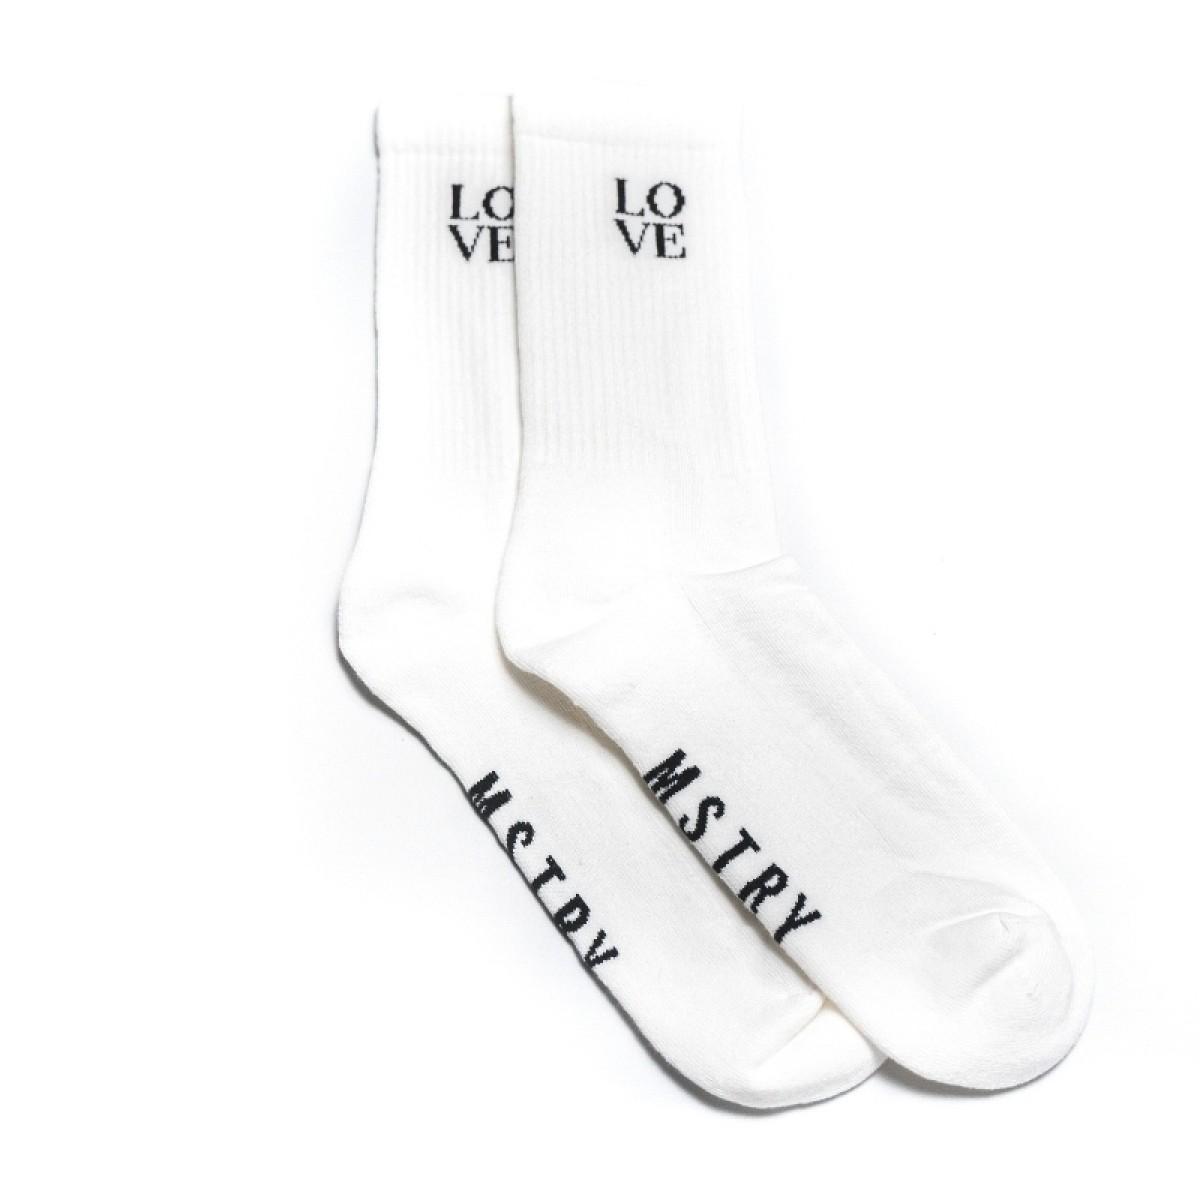 MSTRY Berlin - Love Socken